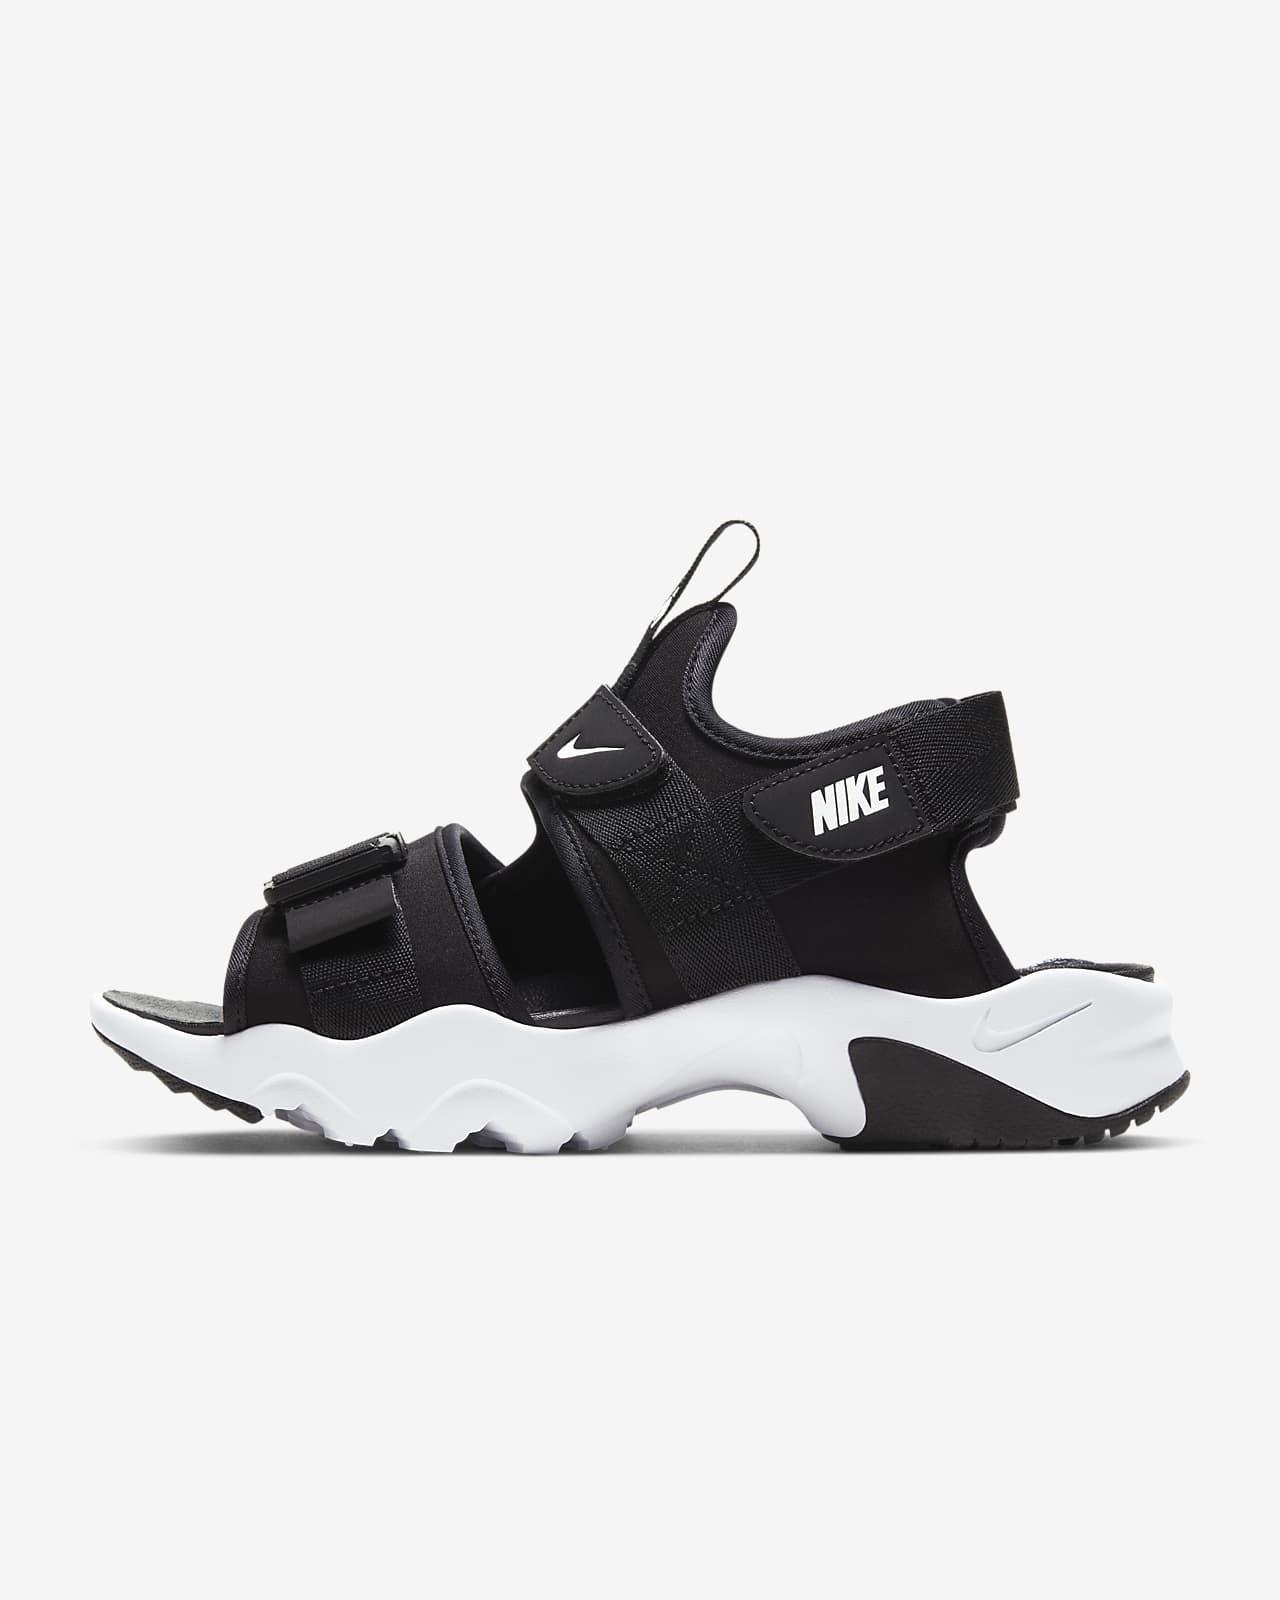 Sandalias para mujer Nike Canyon